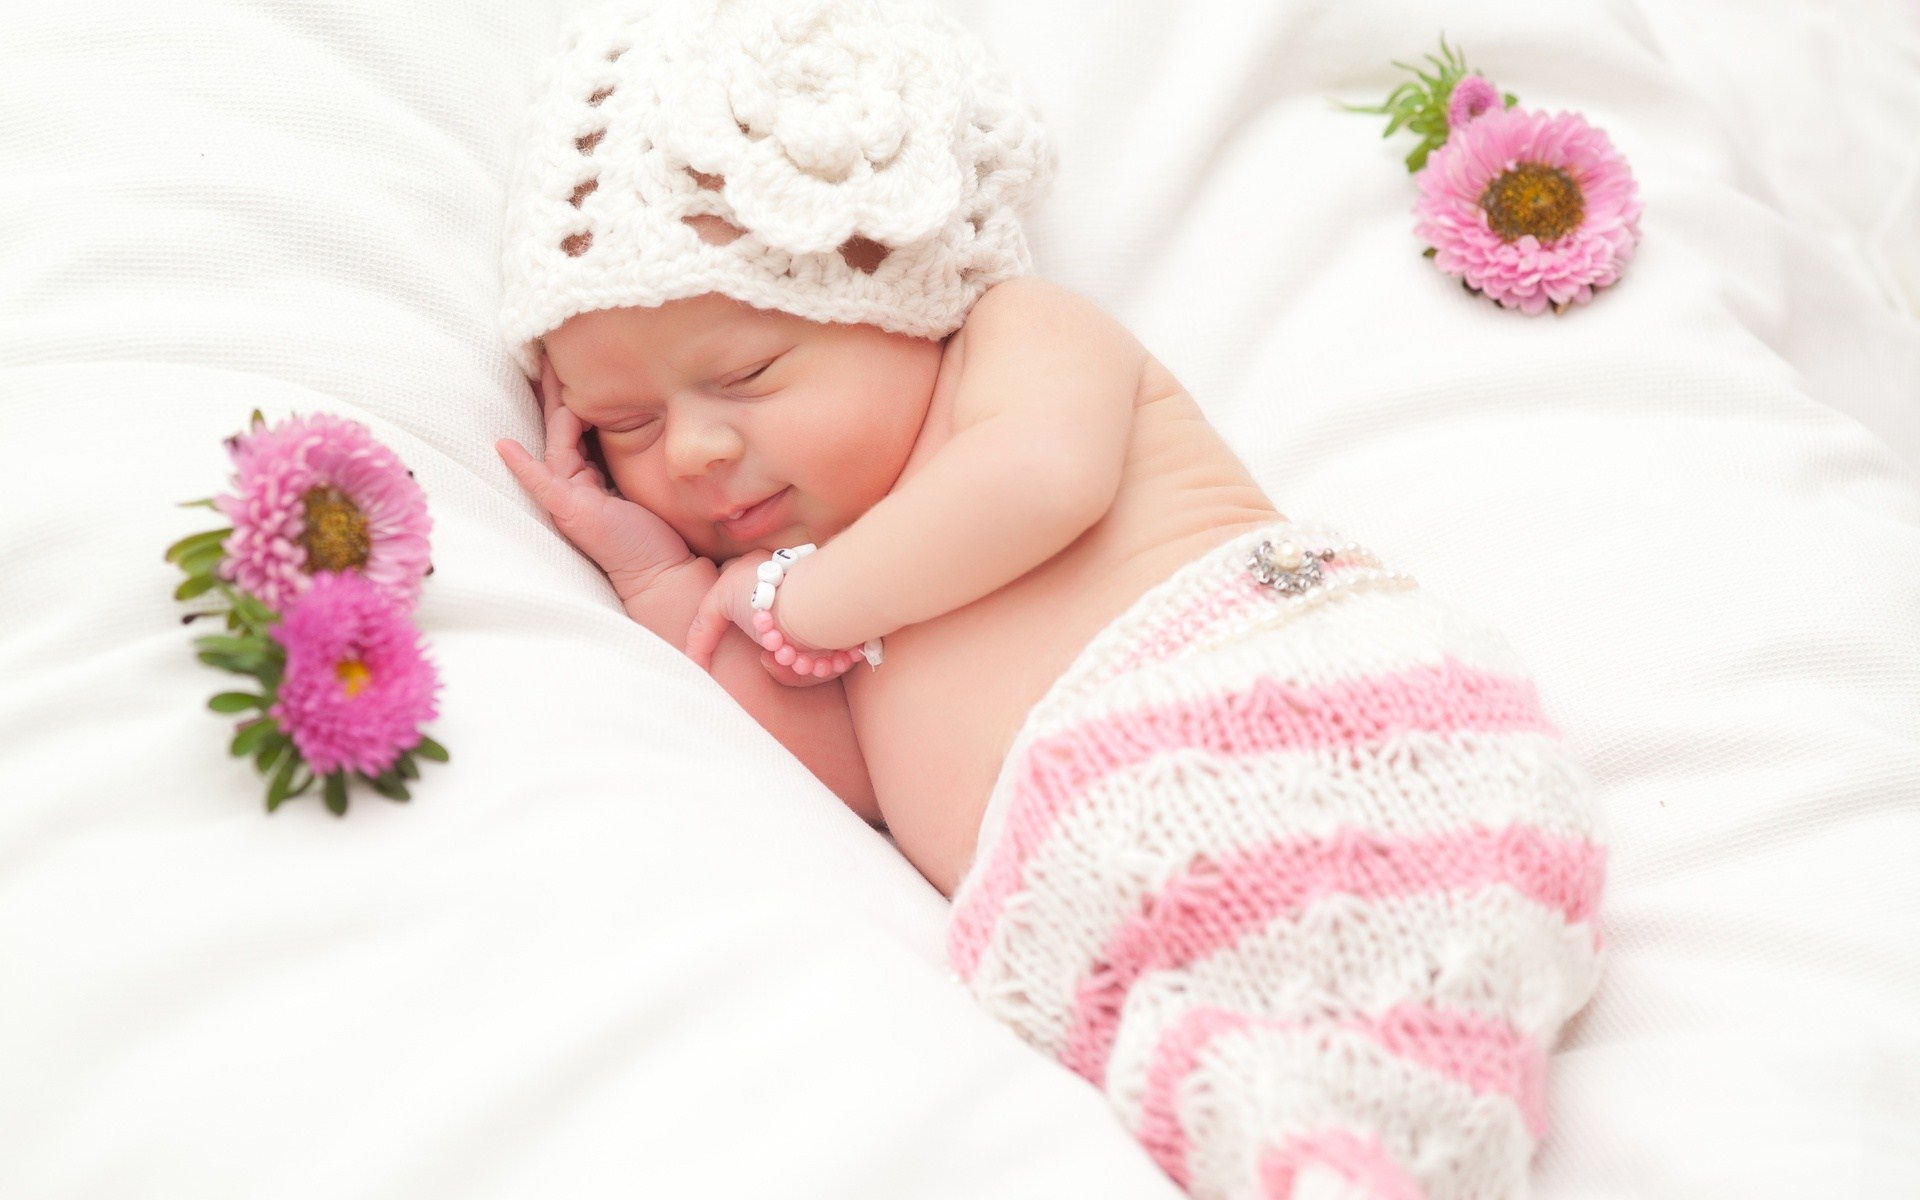 sleeping baby hd wallpaper photos - hd wallpaper